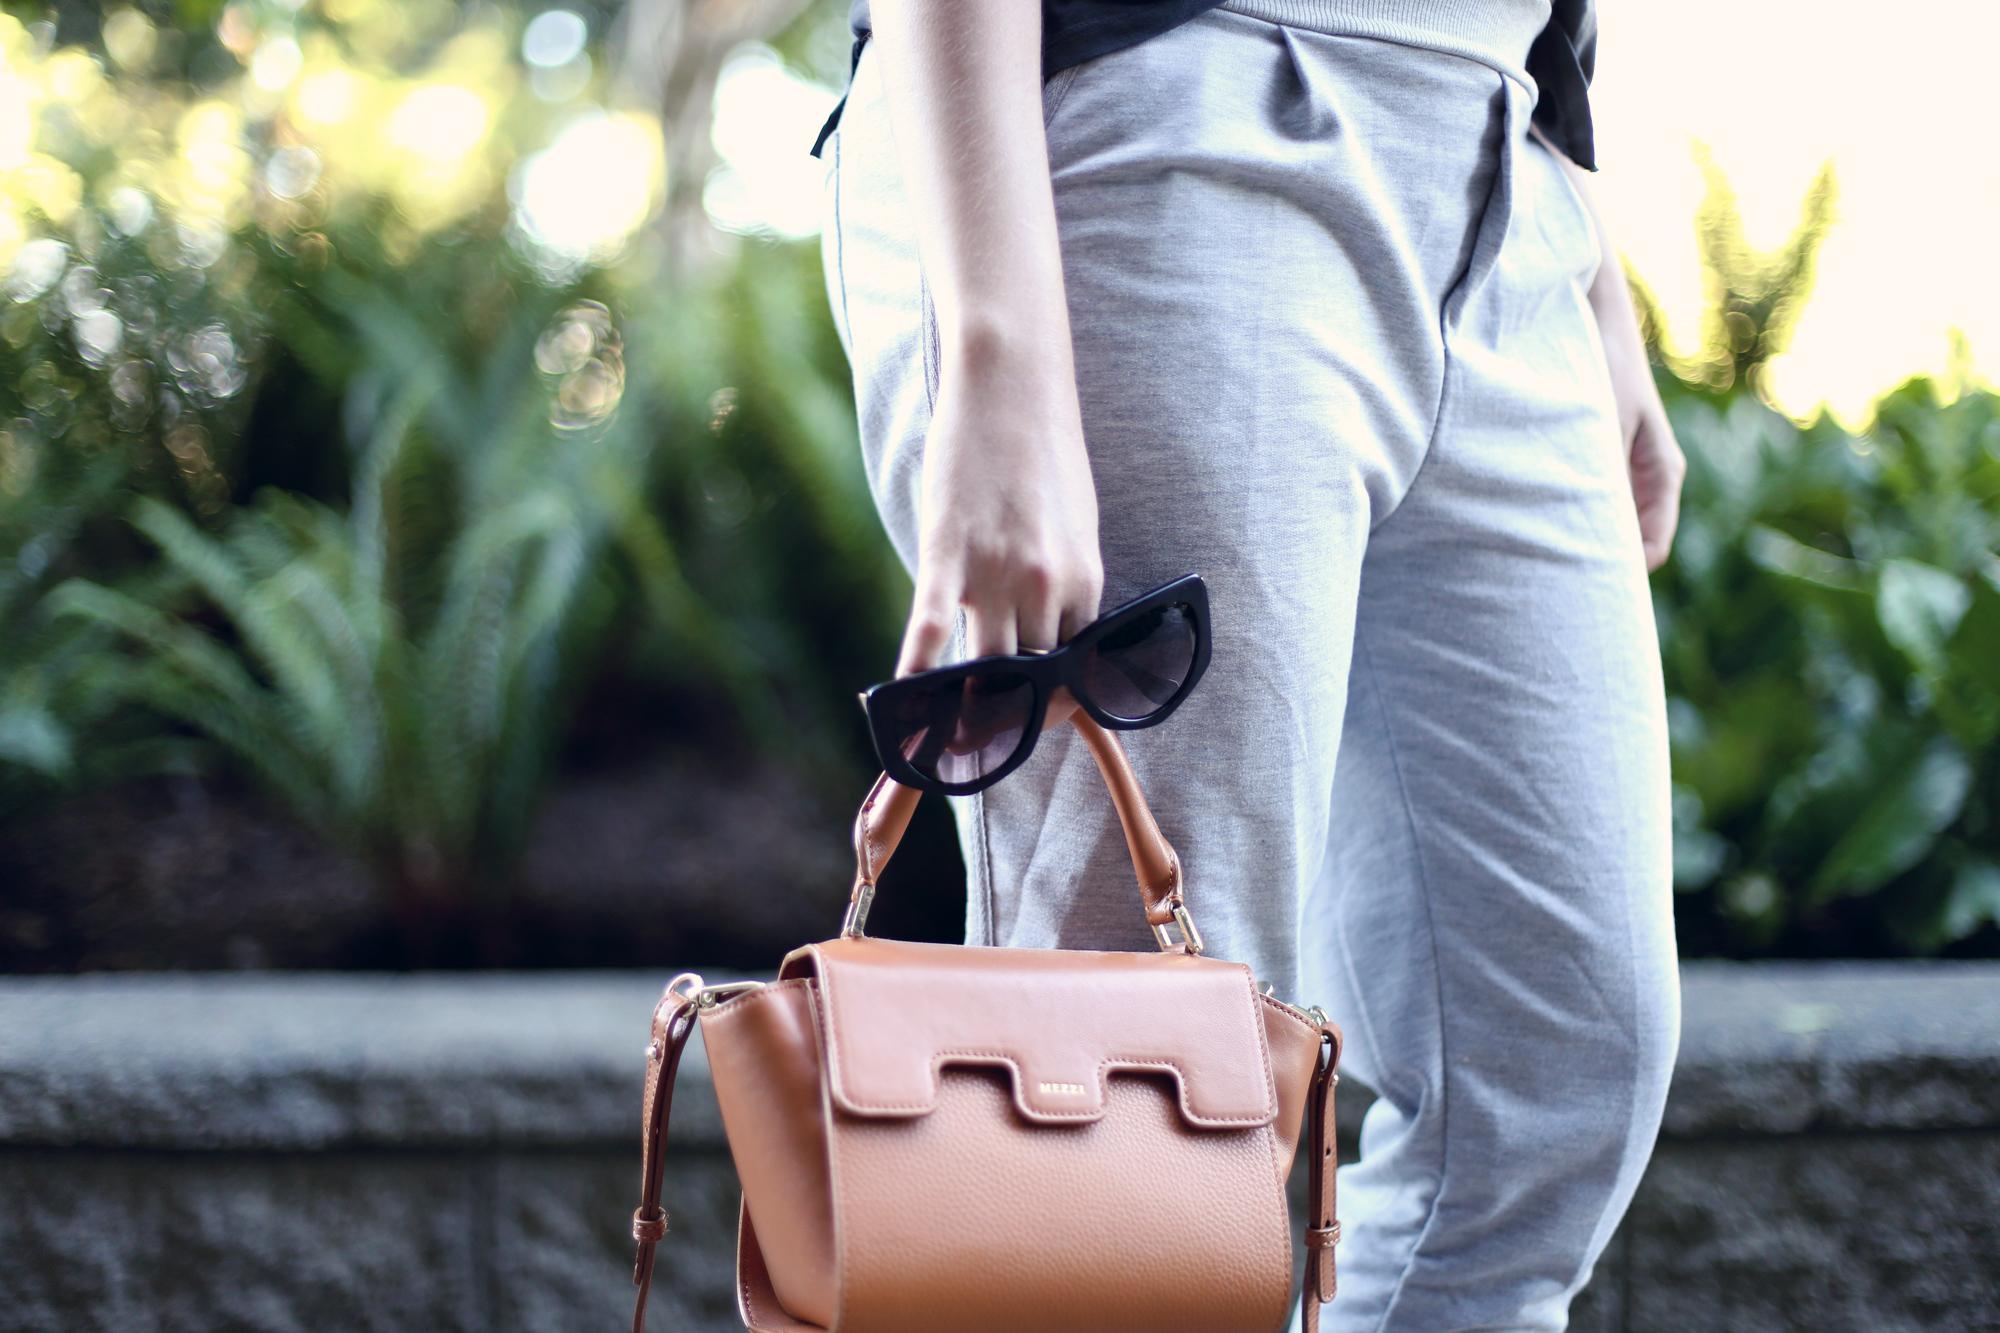 Minimalist accessories: a tan leather bag and black sunglasses.